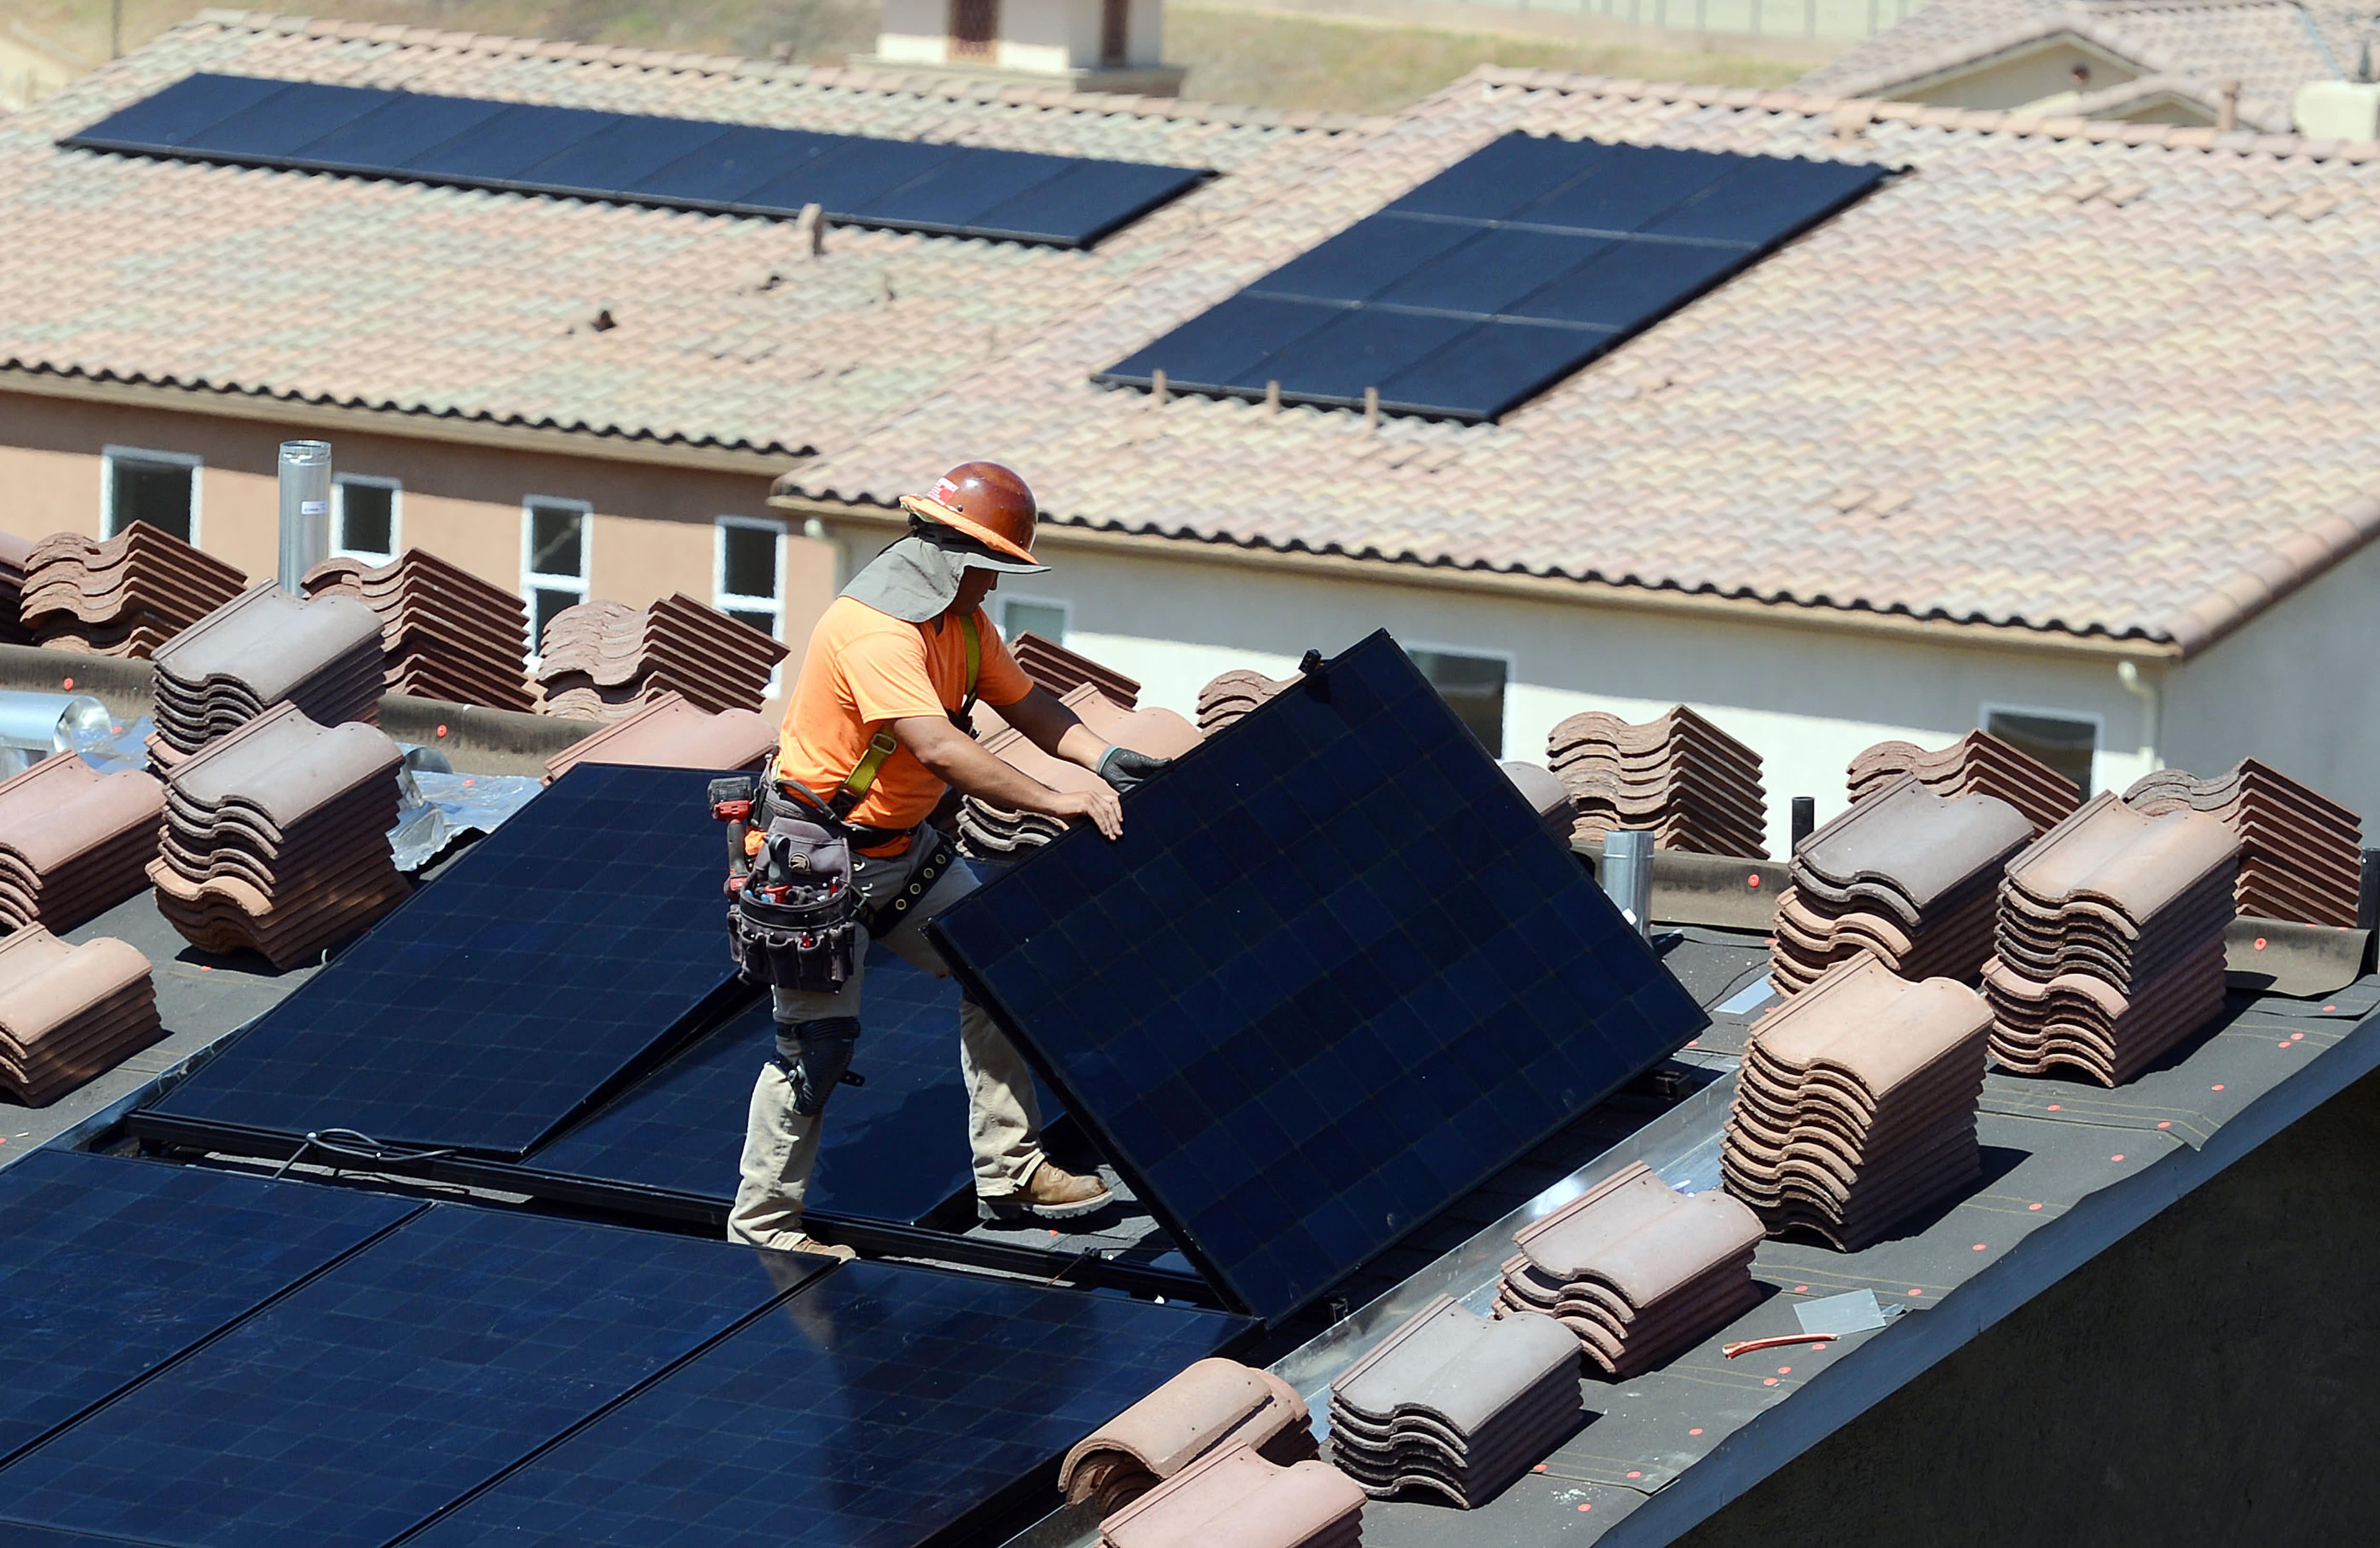 Net zero-energy homes will transform US real estate market